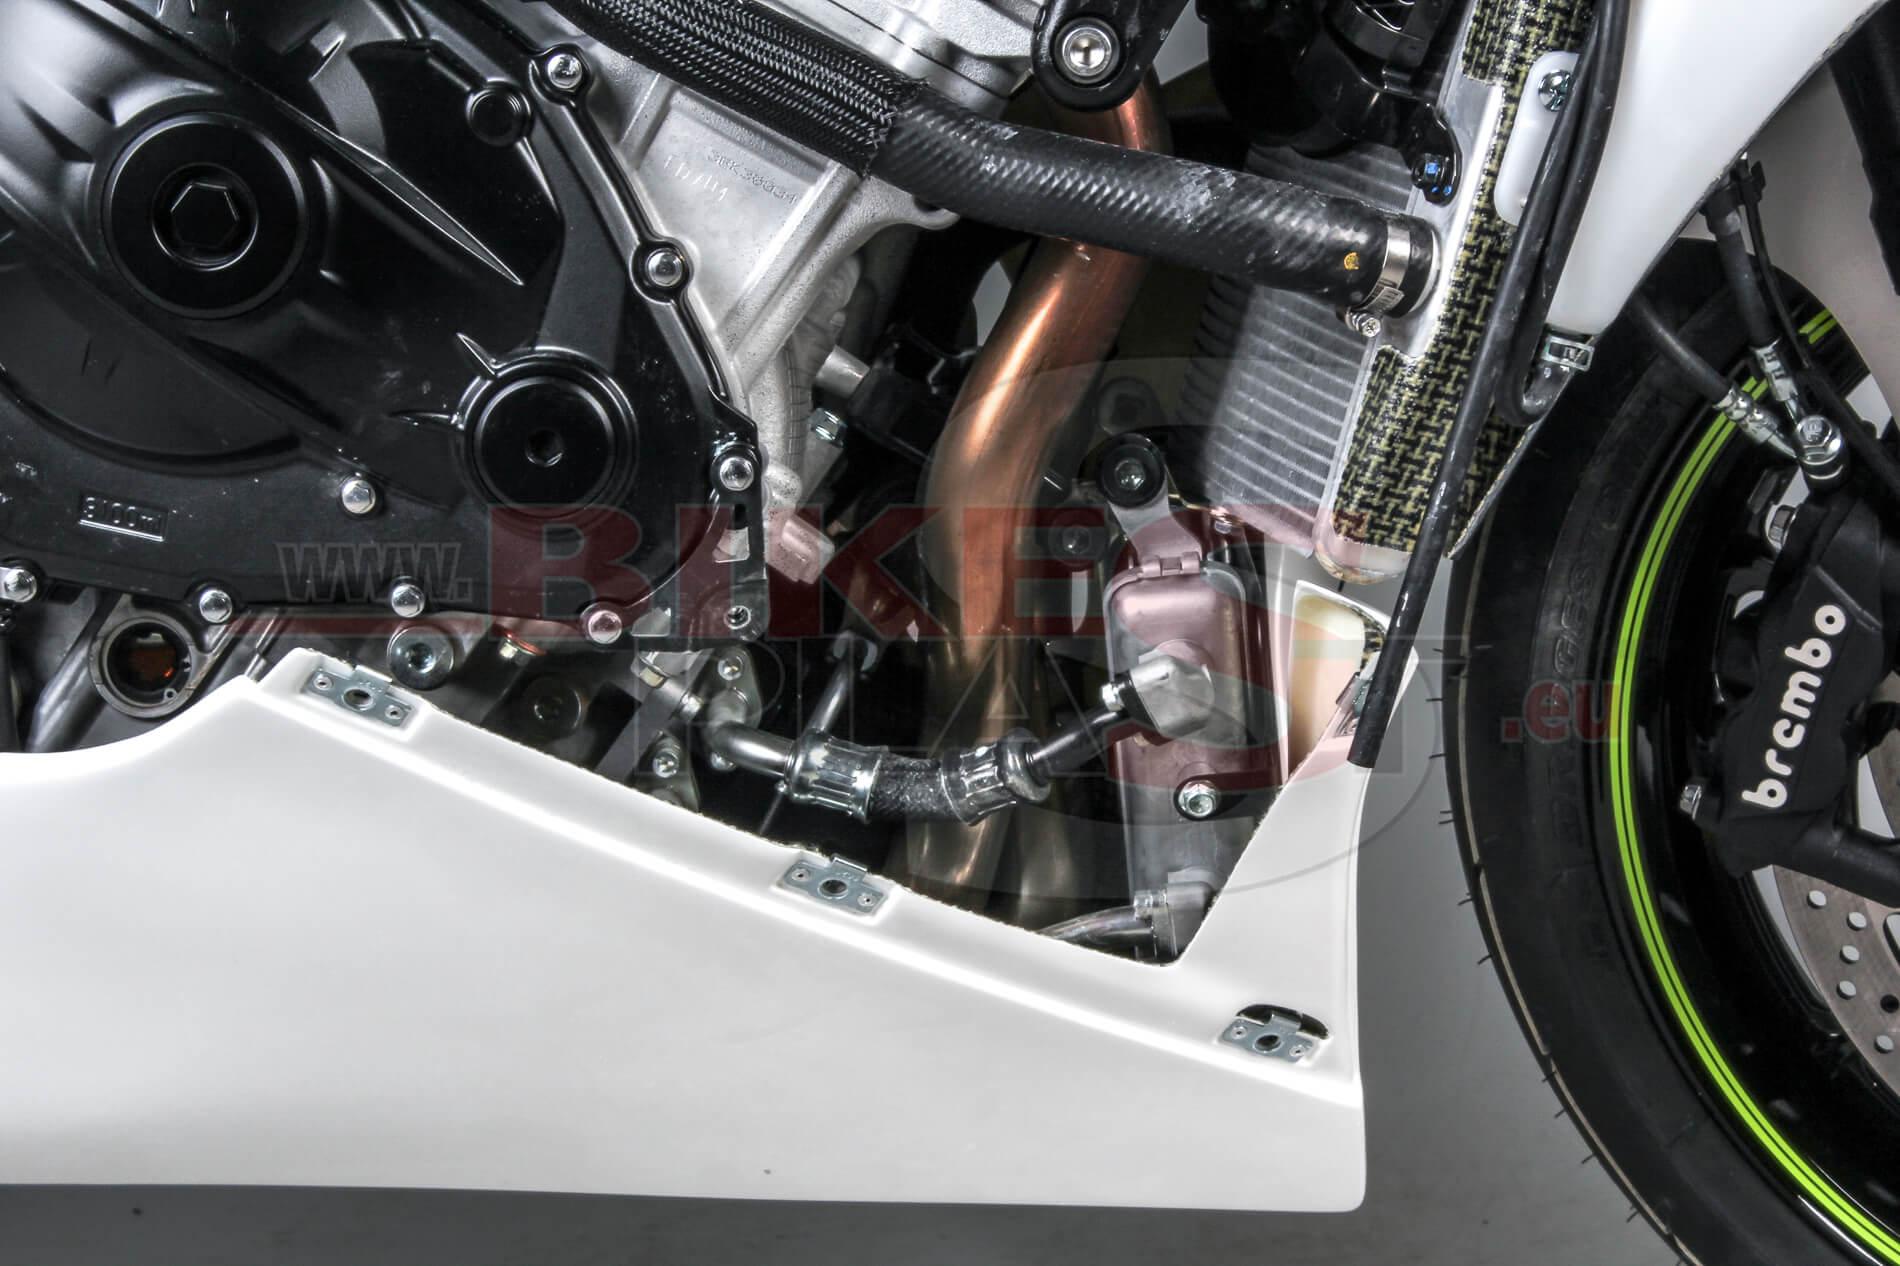 Kit Suzuki Gsx R 1000 2017 Fairings Amp Bodywork Set